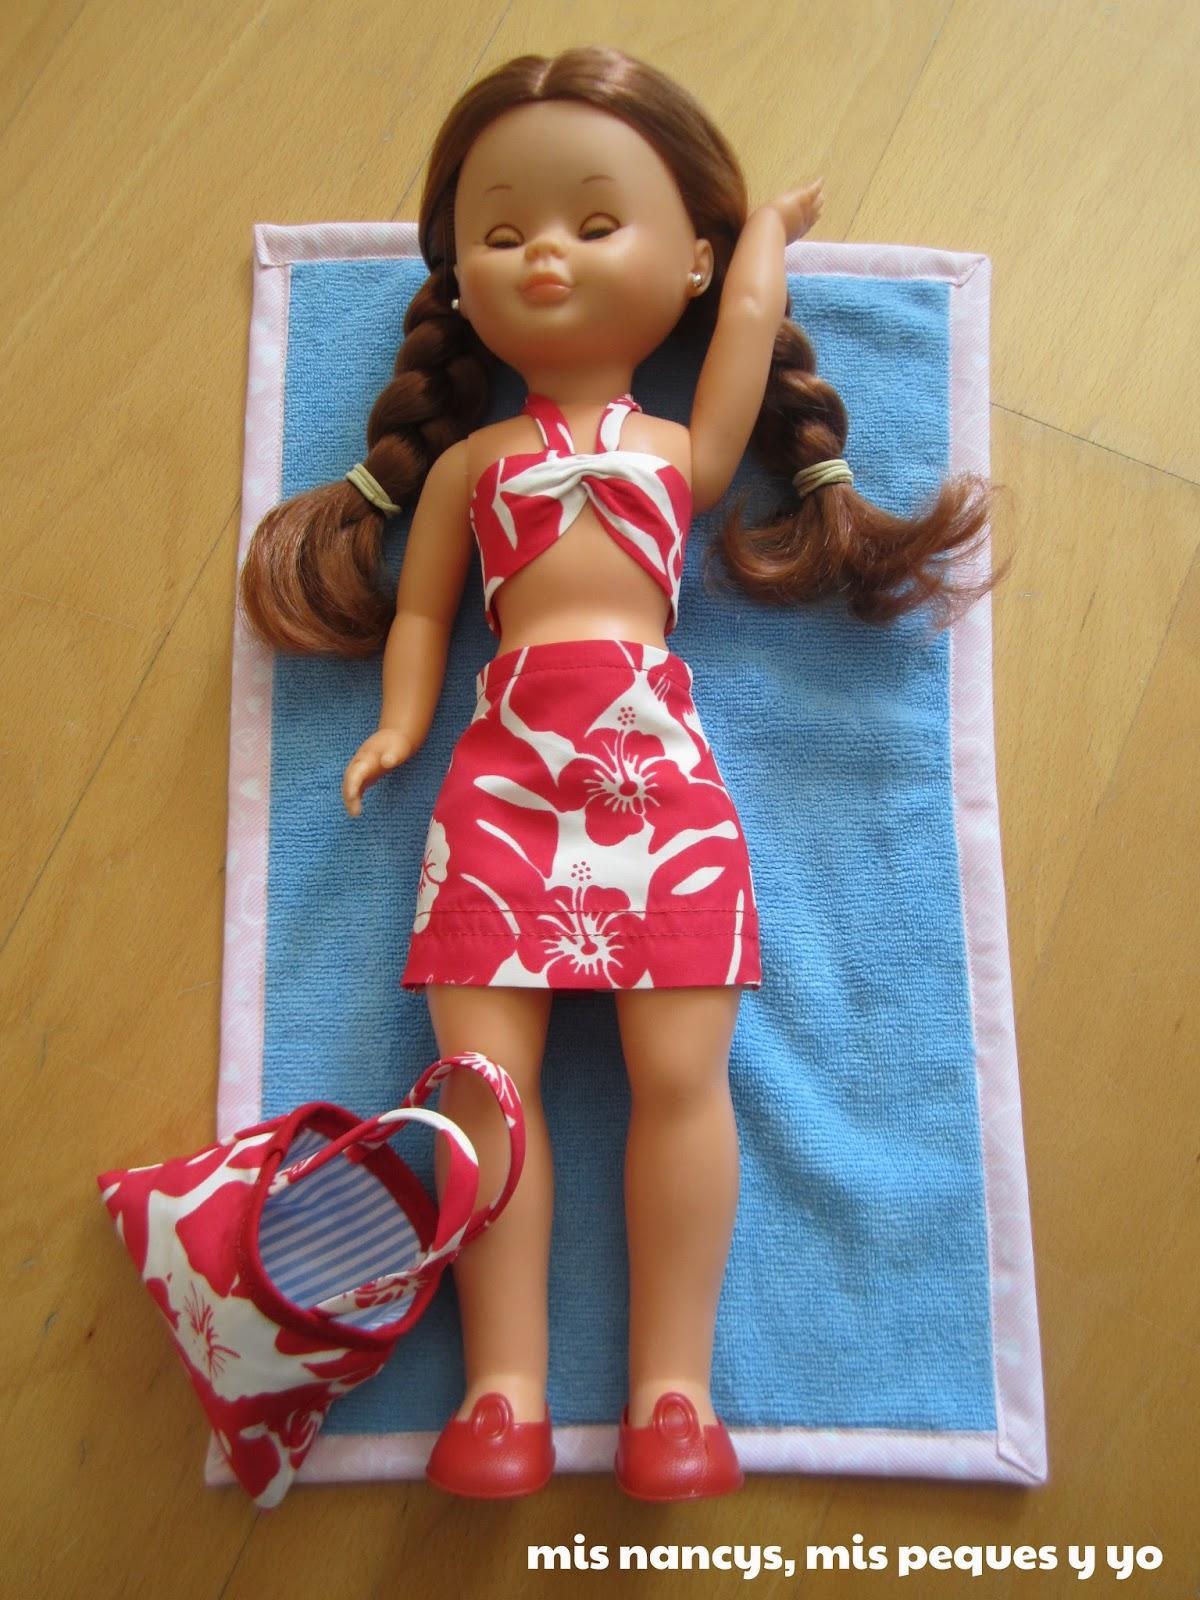 mis nancys, mis peques y yo, conjunto playero nancy tumbada en la toalla